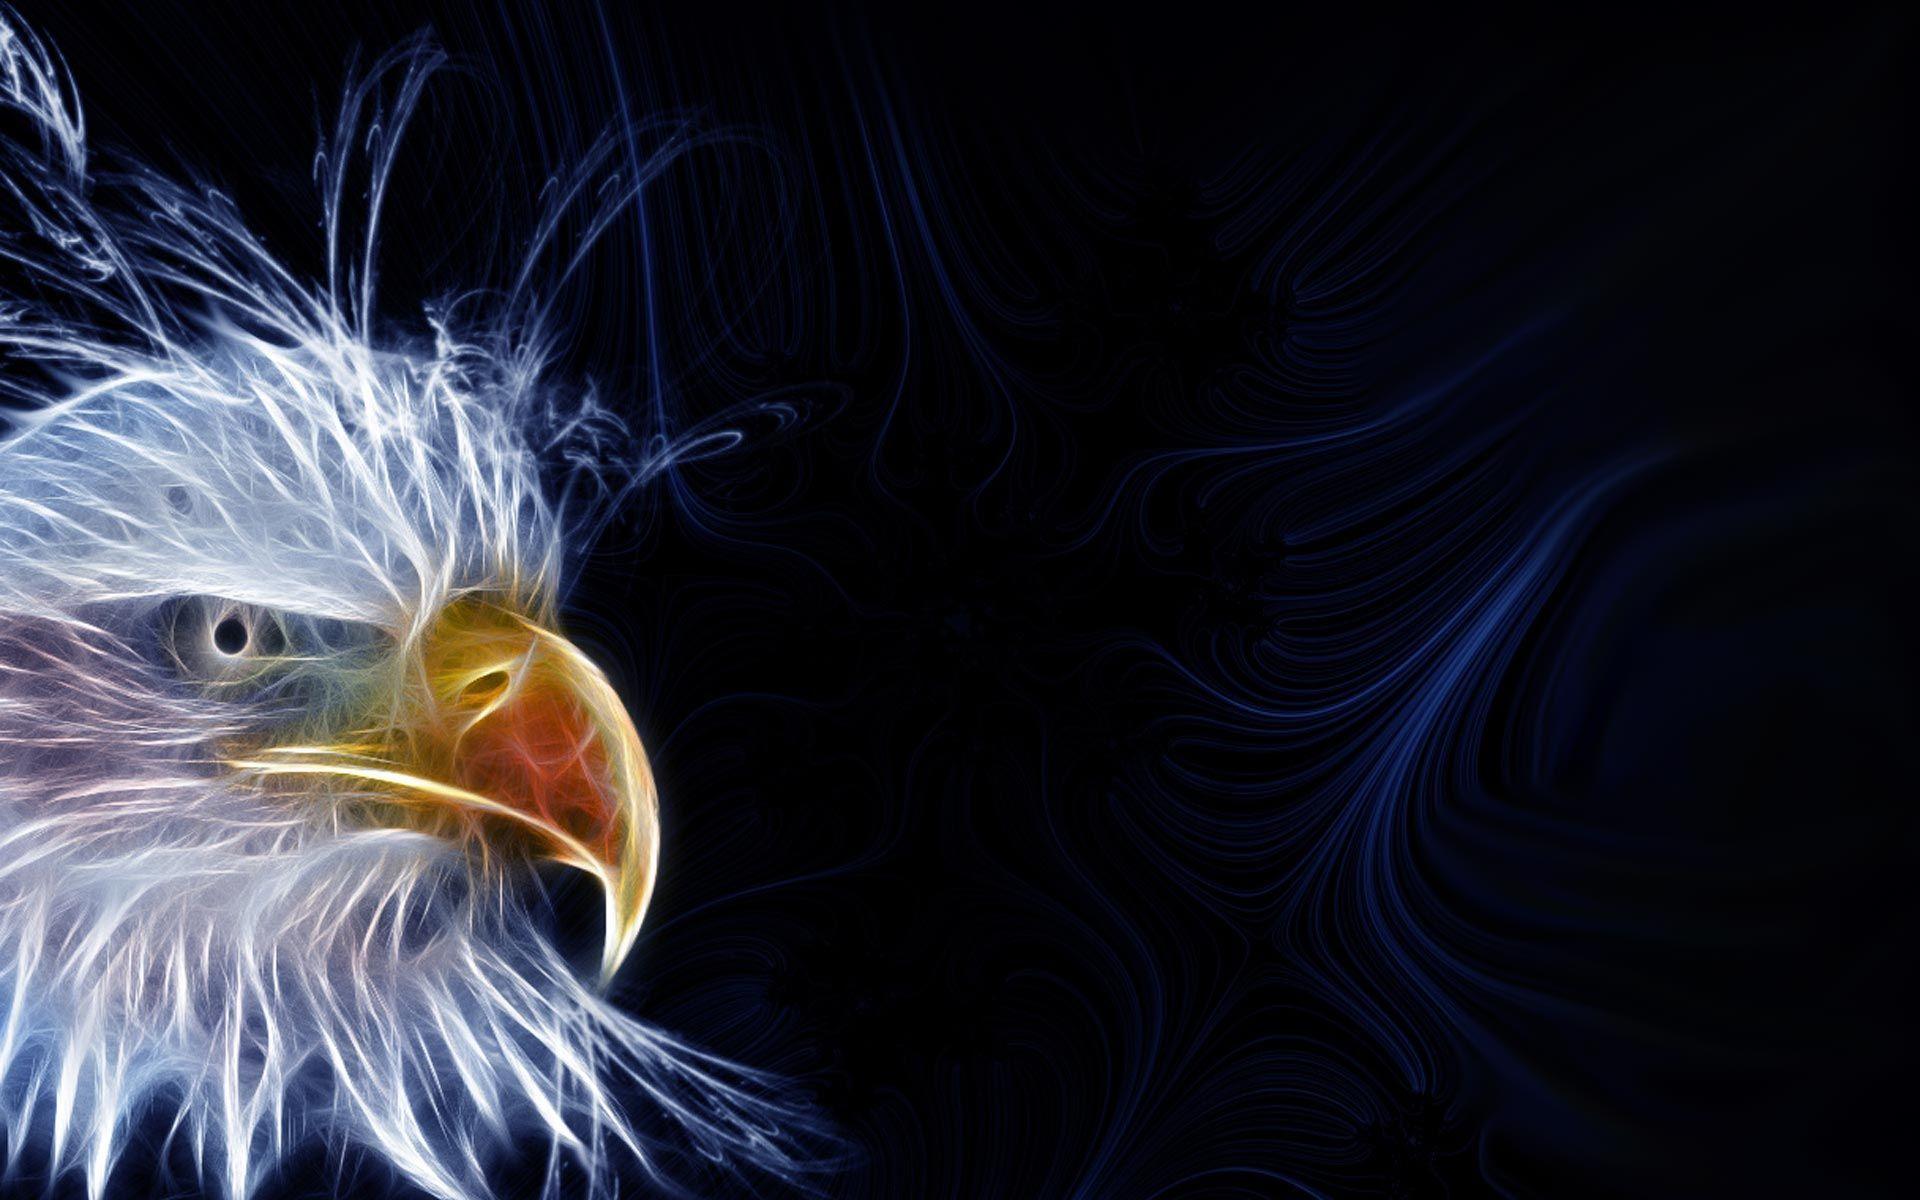 Hd wallpaper eagle - Bald Eagle Hd Wallpapers This Wallpaper